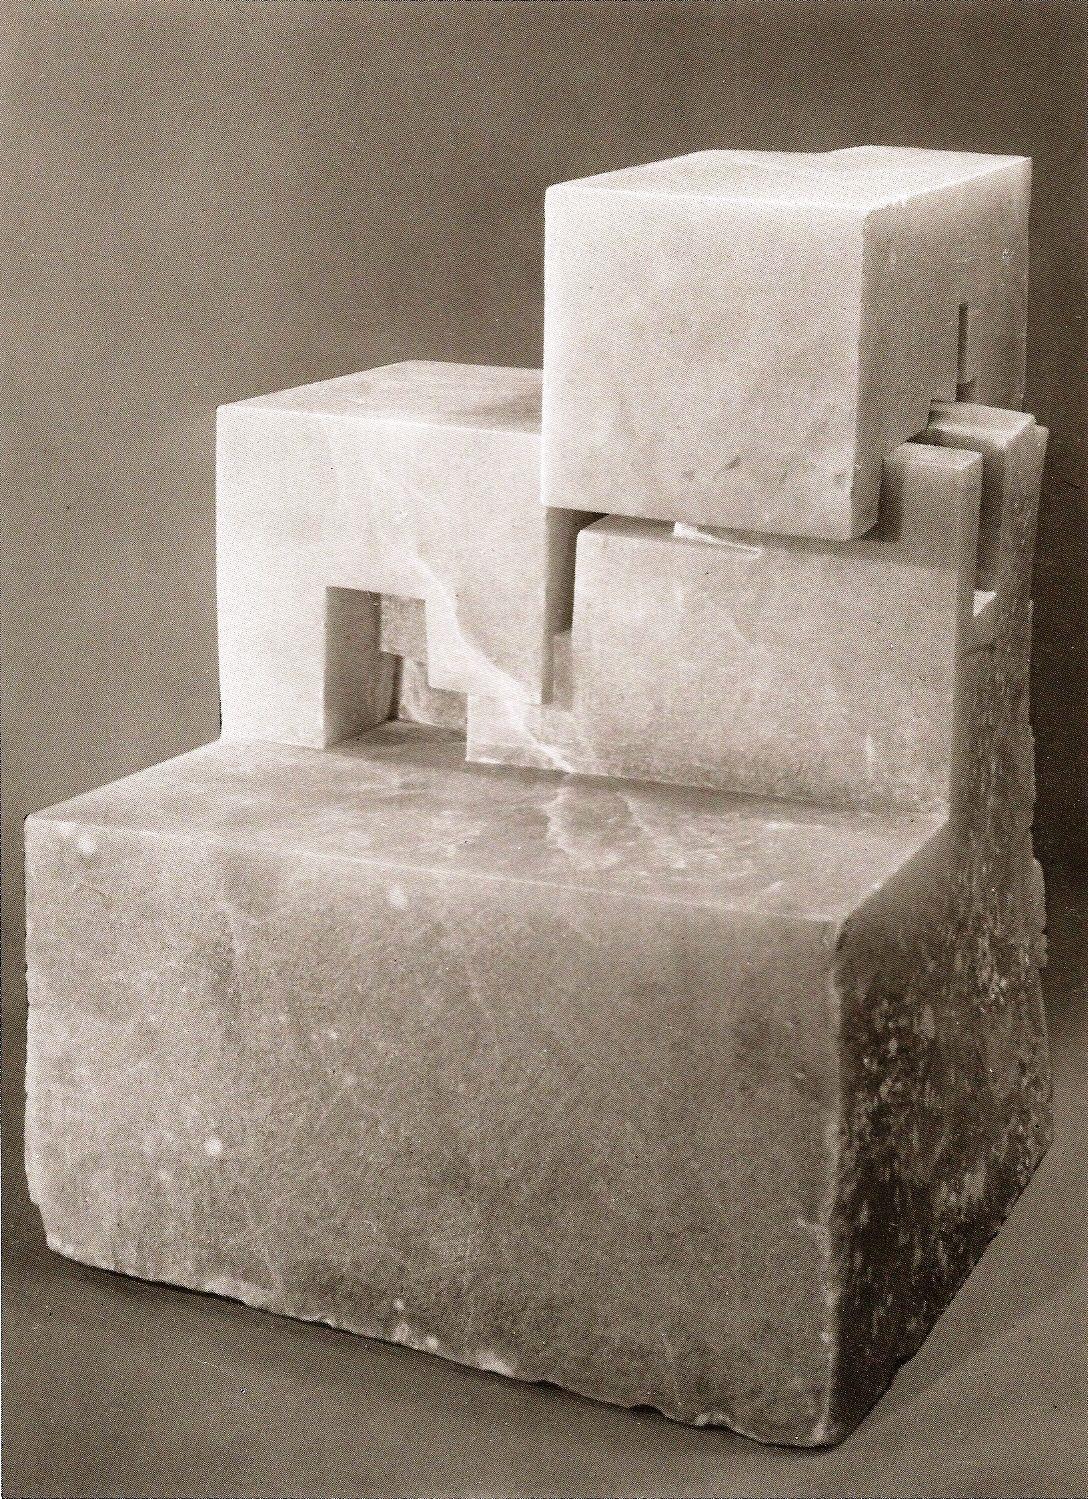 how to create wax molds